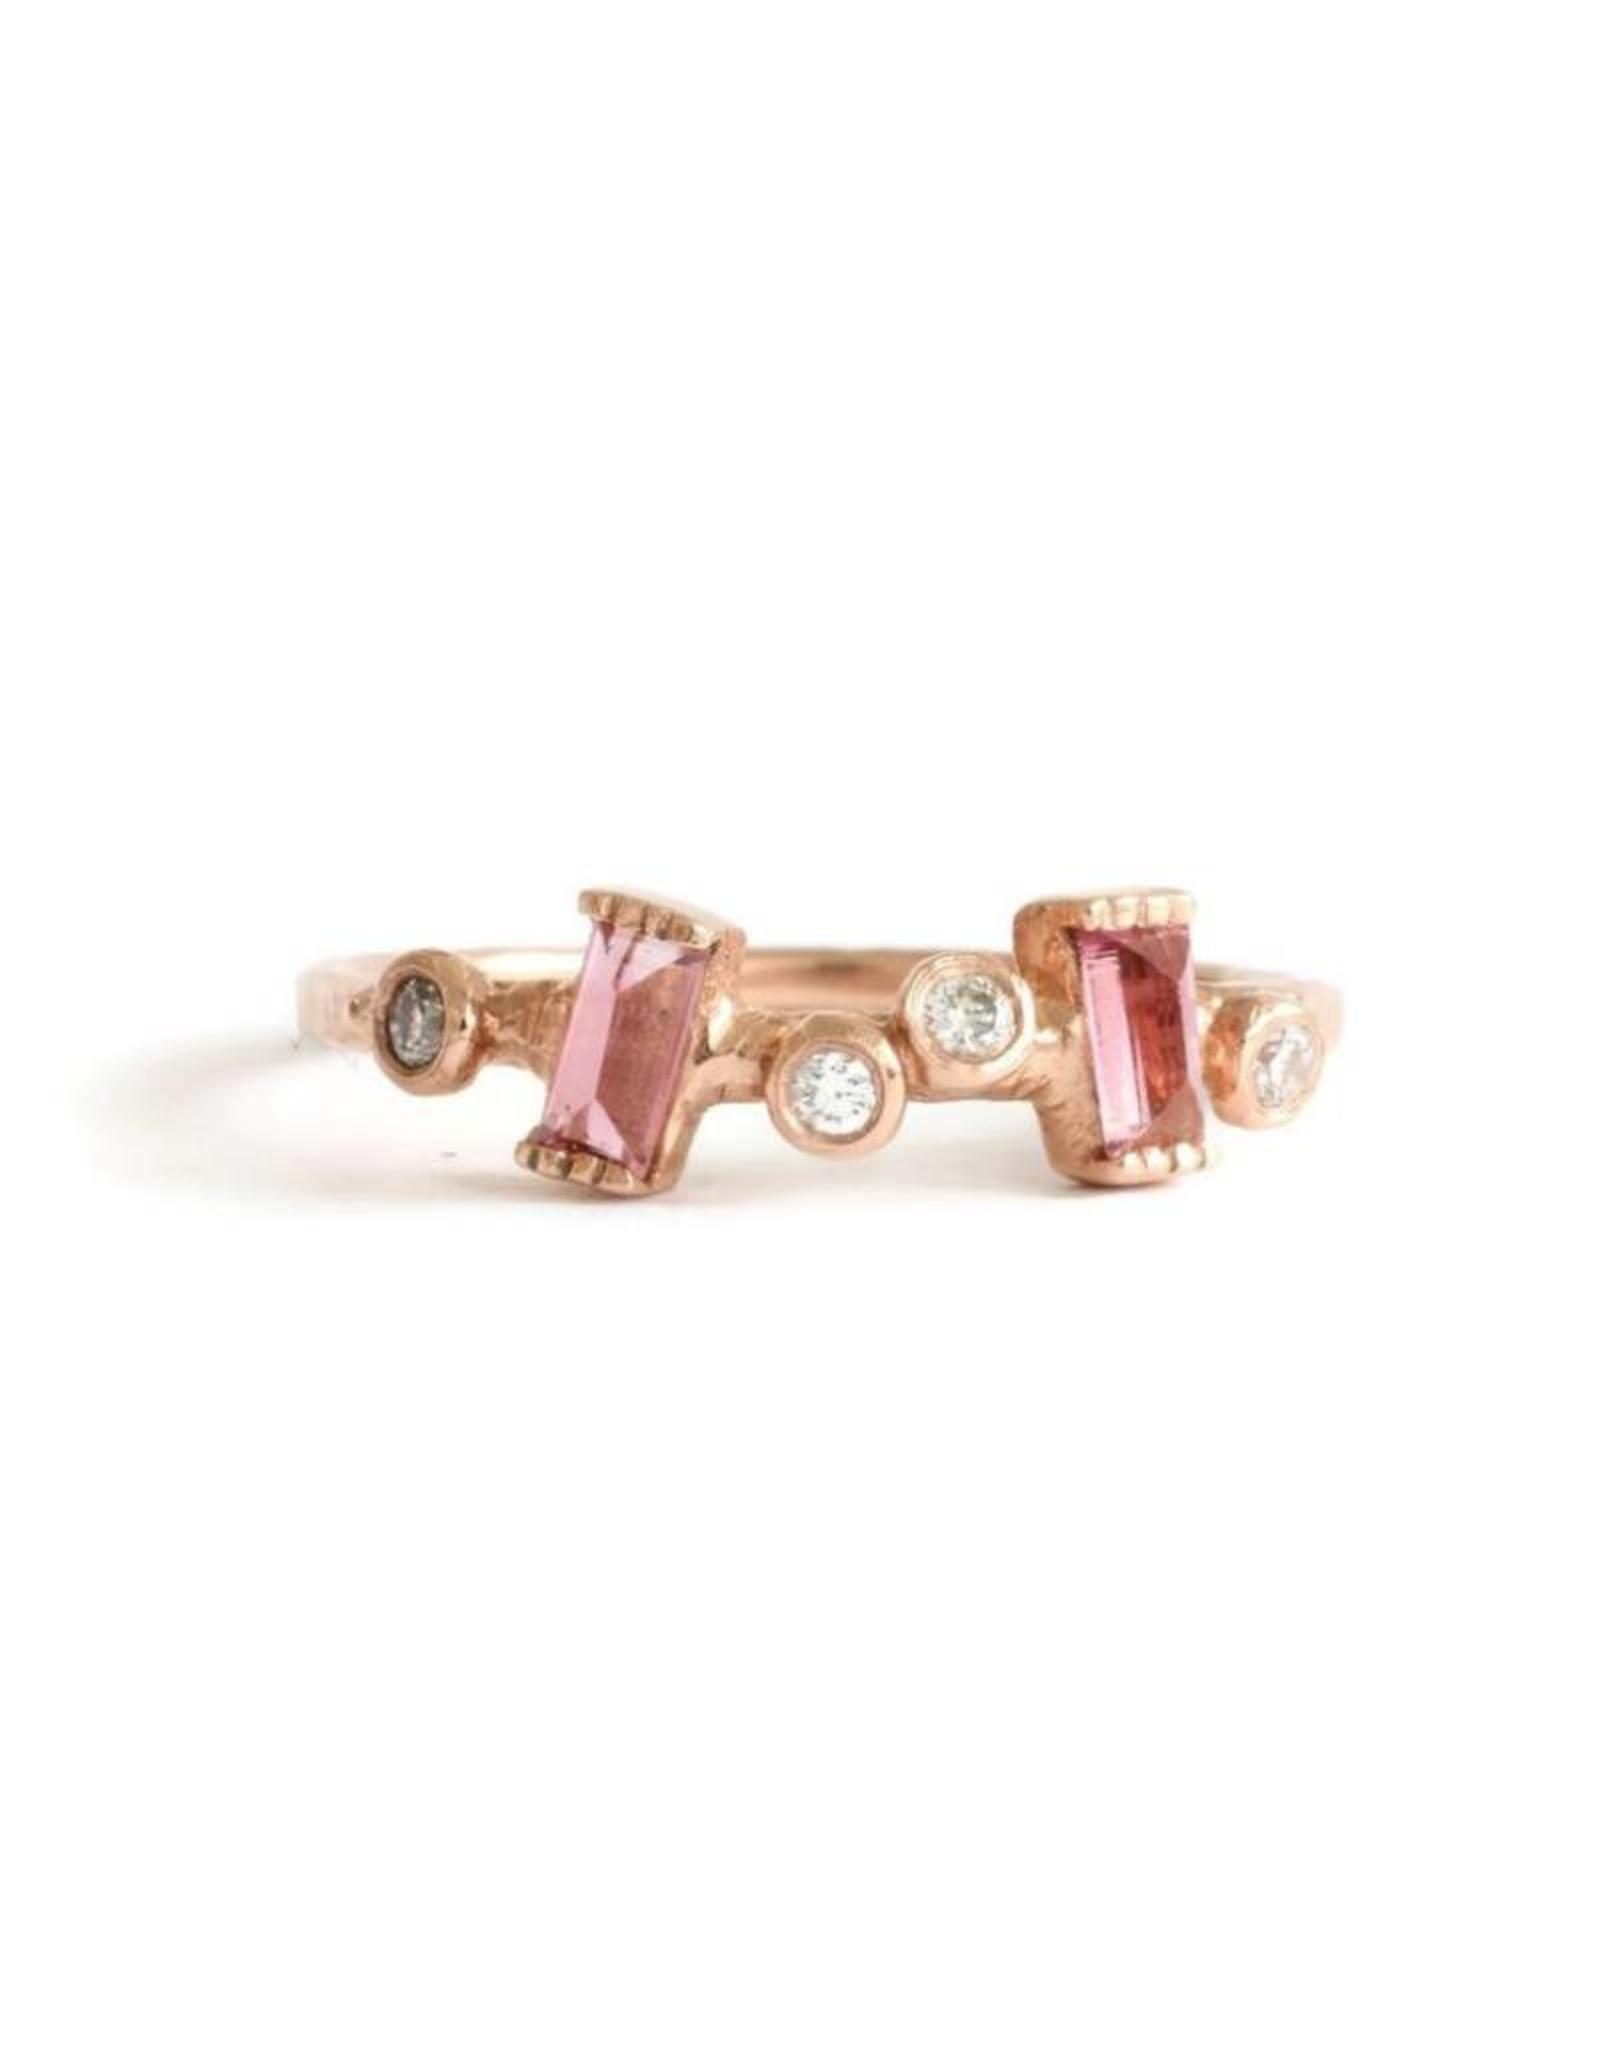 Lio & Linn Garden Ring - Pink Tourmaline